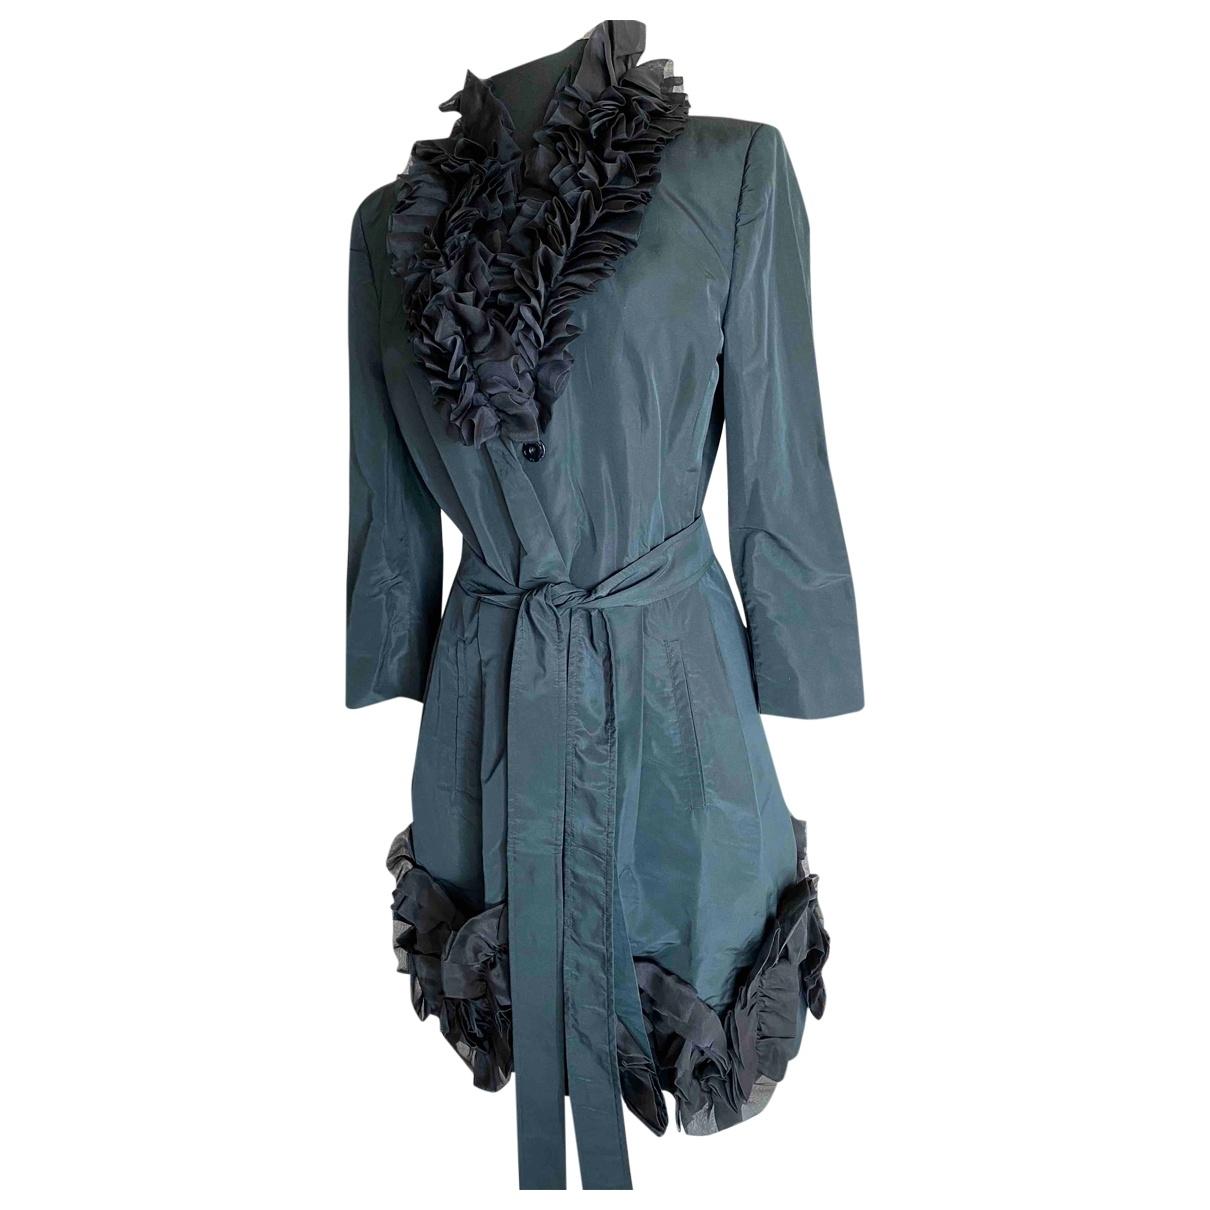 D&g \N Black Silk coat for Women 44 IT